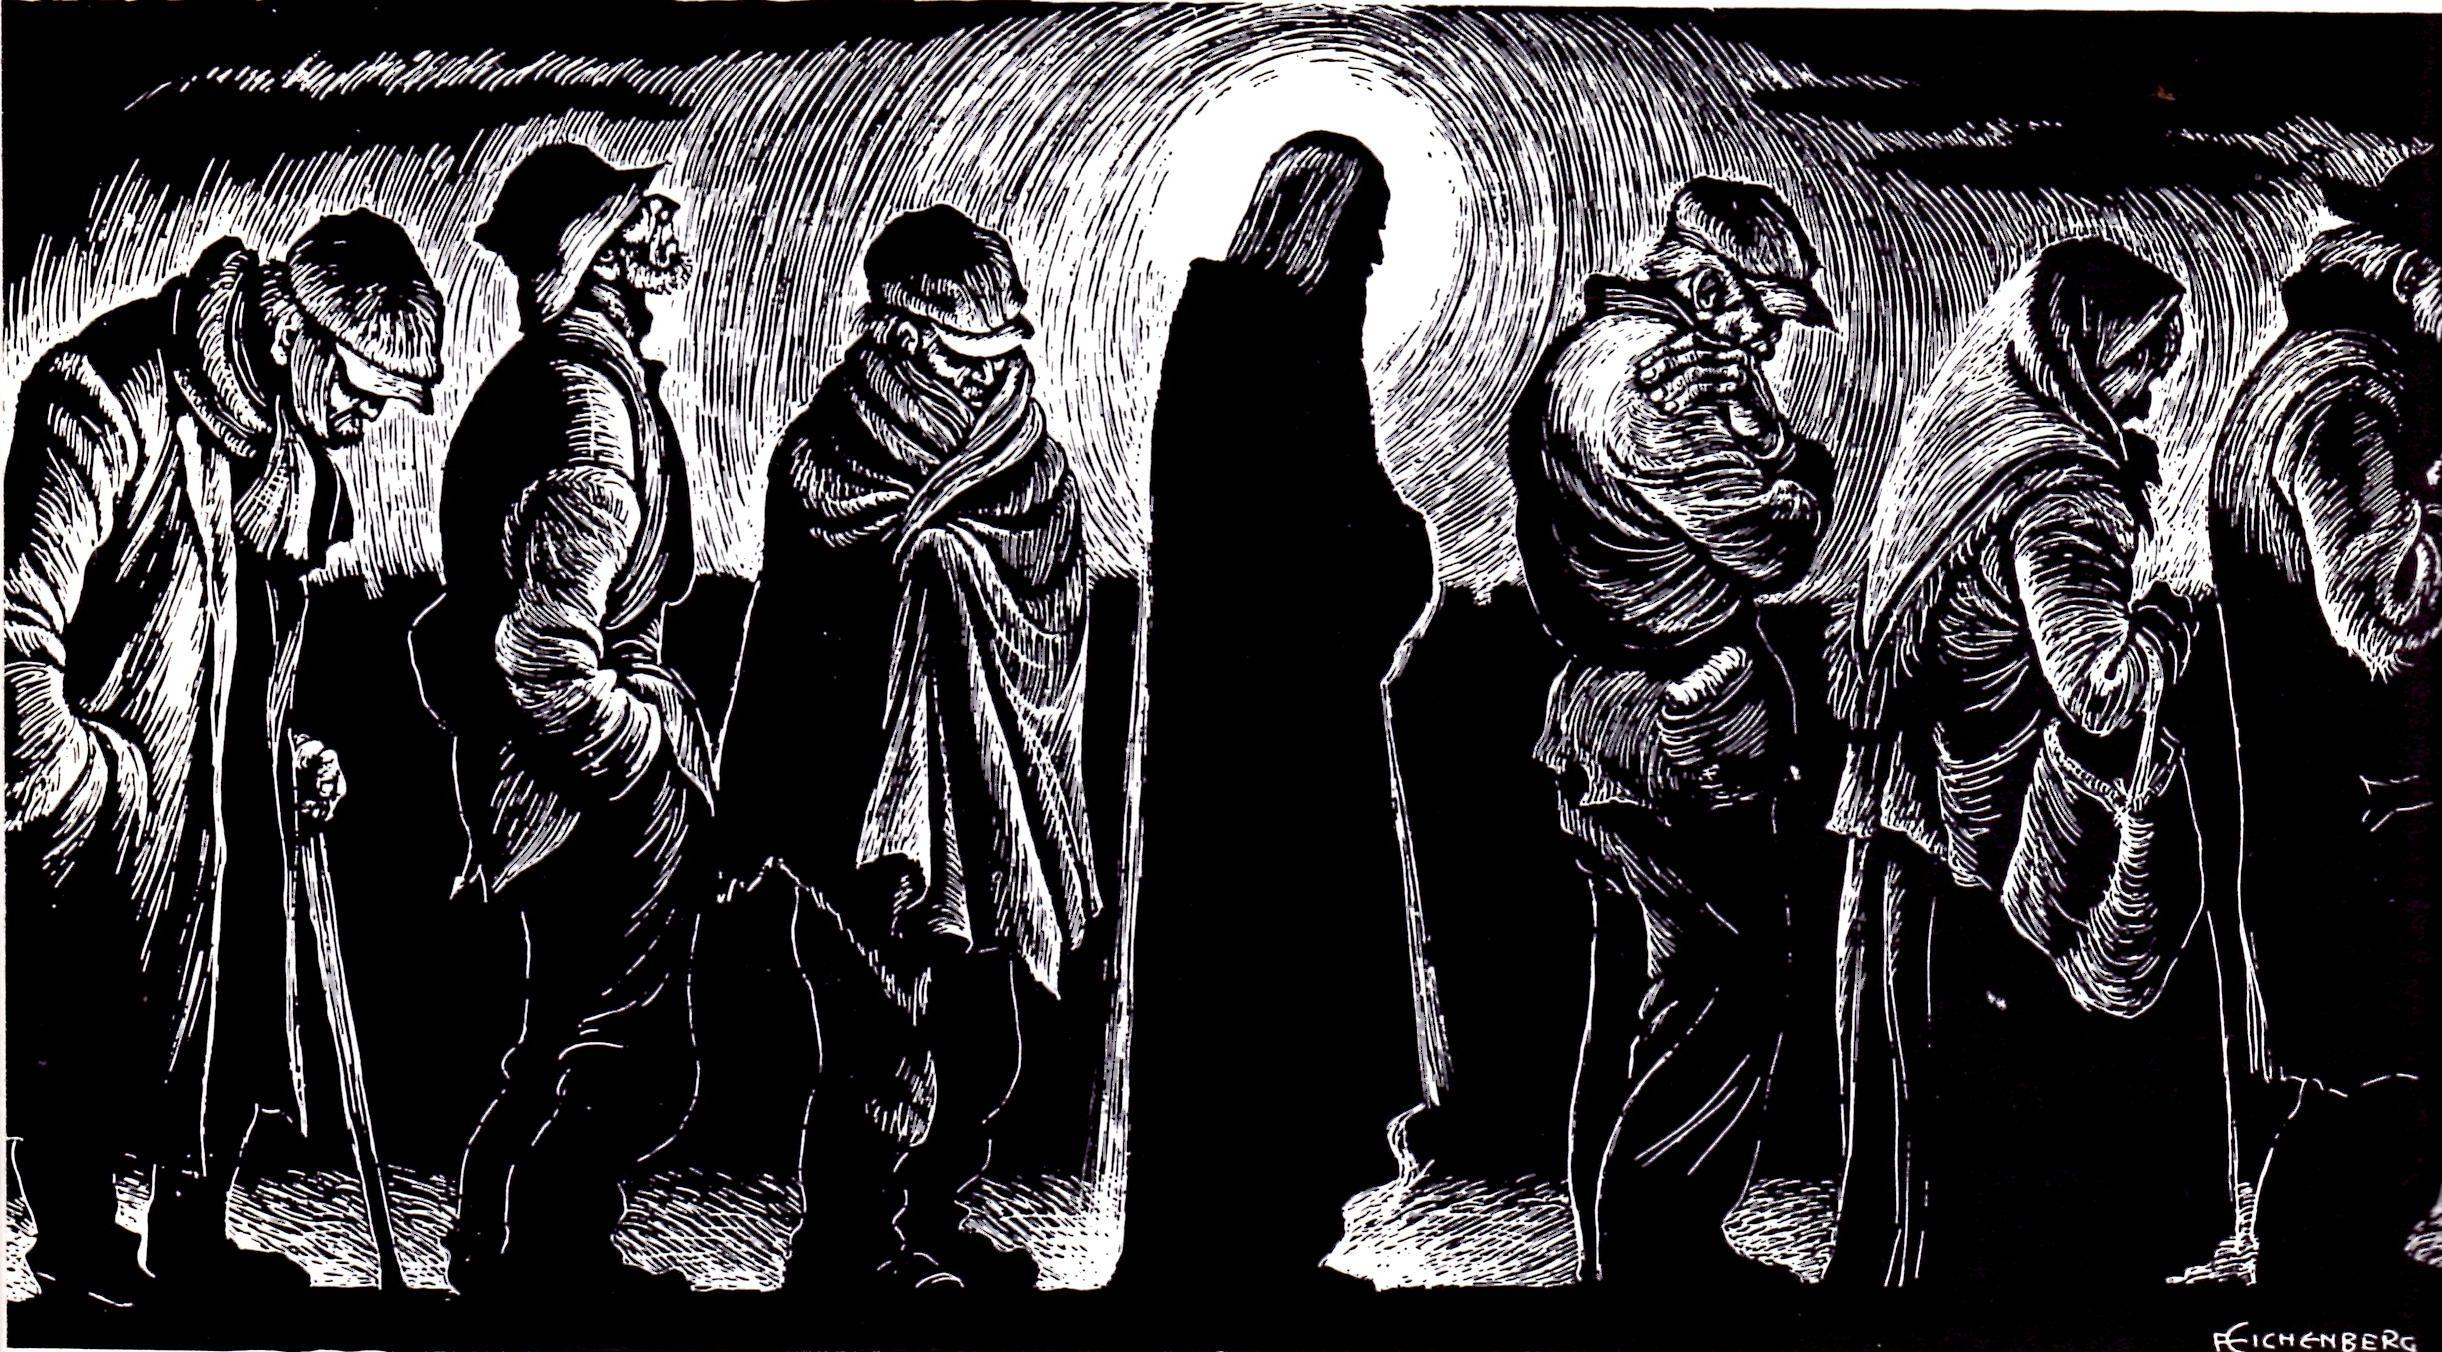 Image of Jesus in a bread line. Artwork.